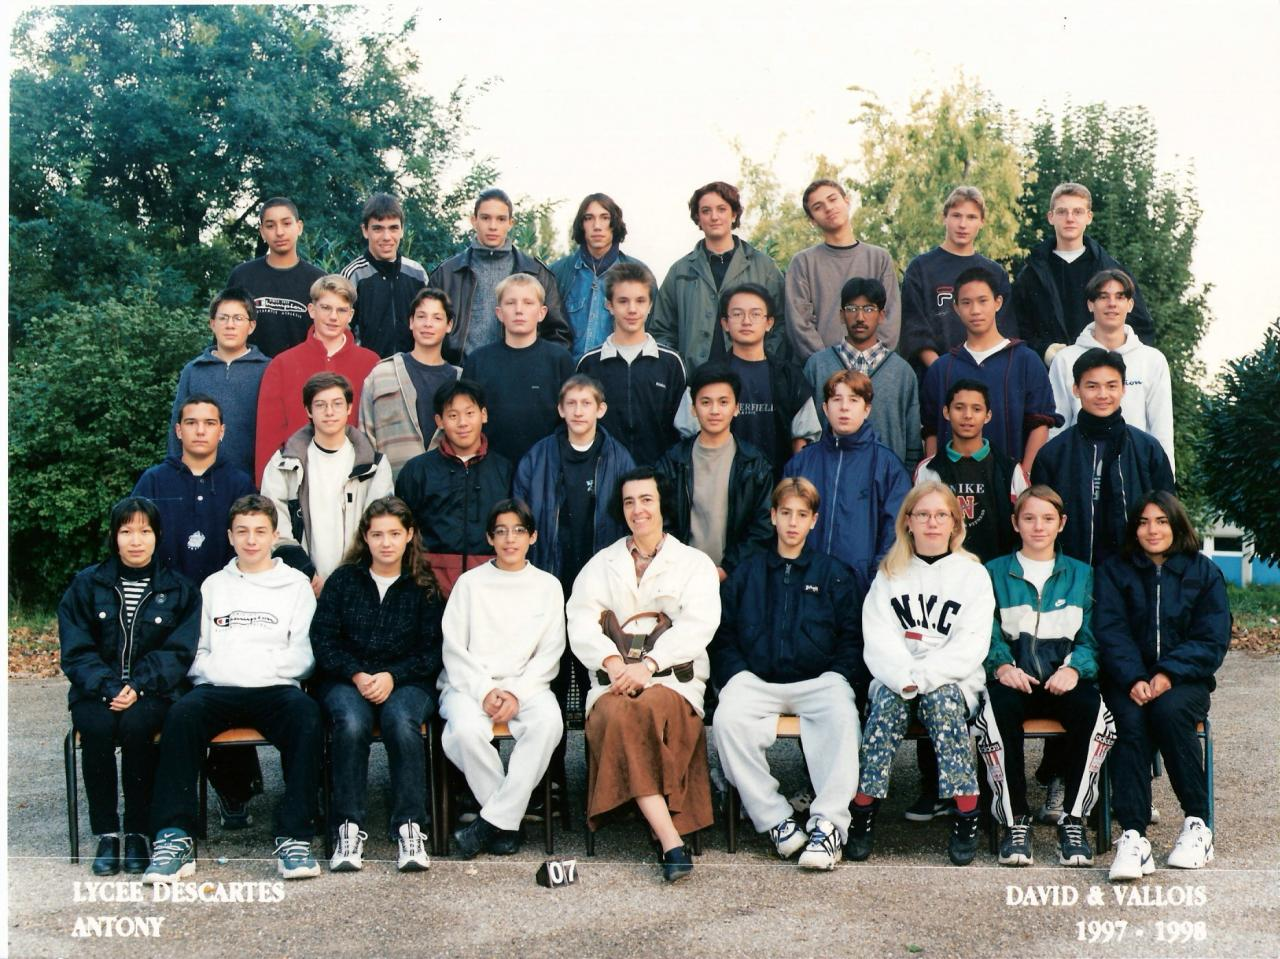 1998 - 2.1 - DAVID